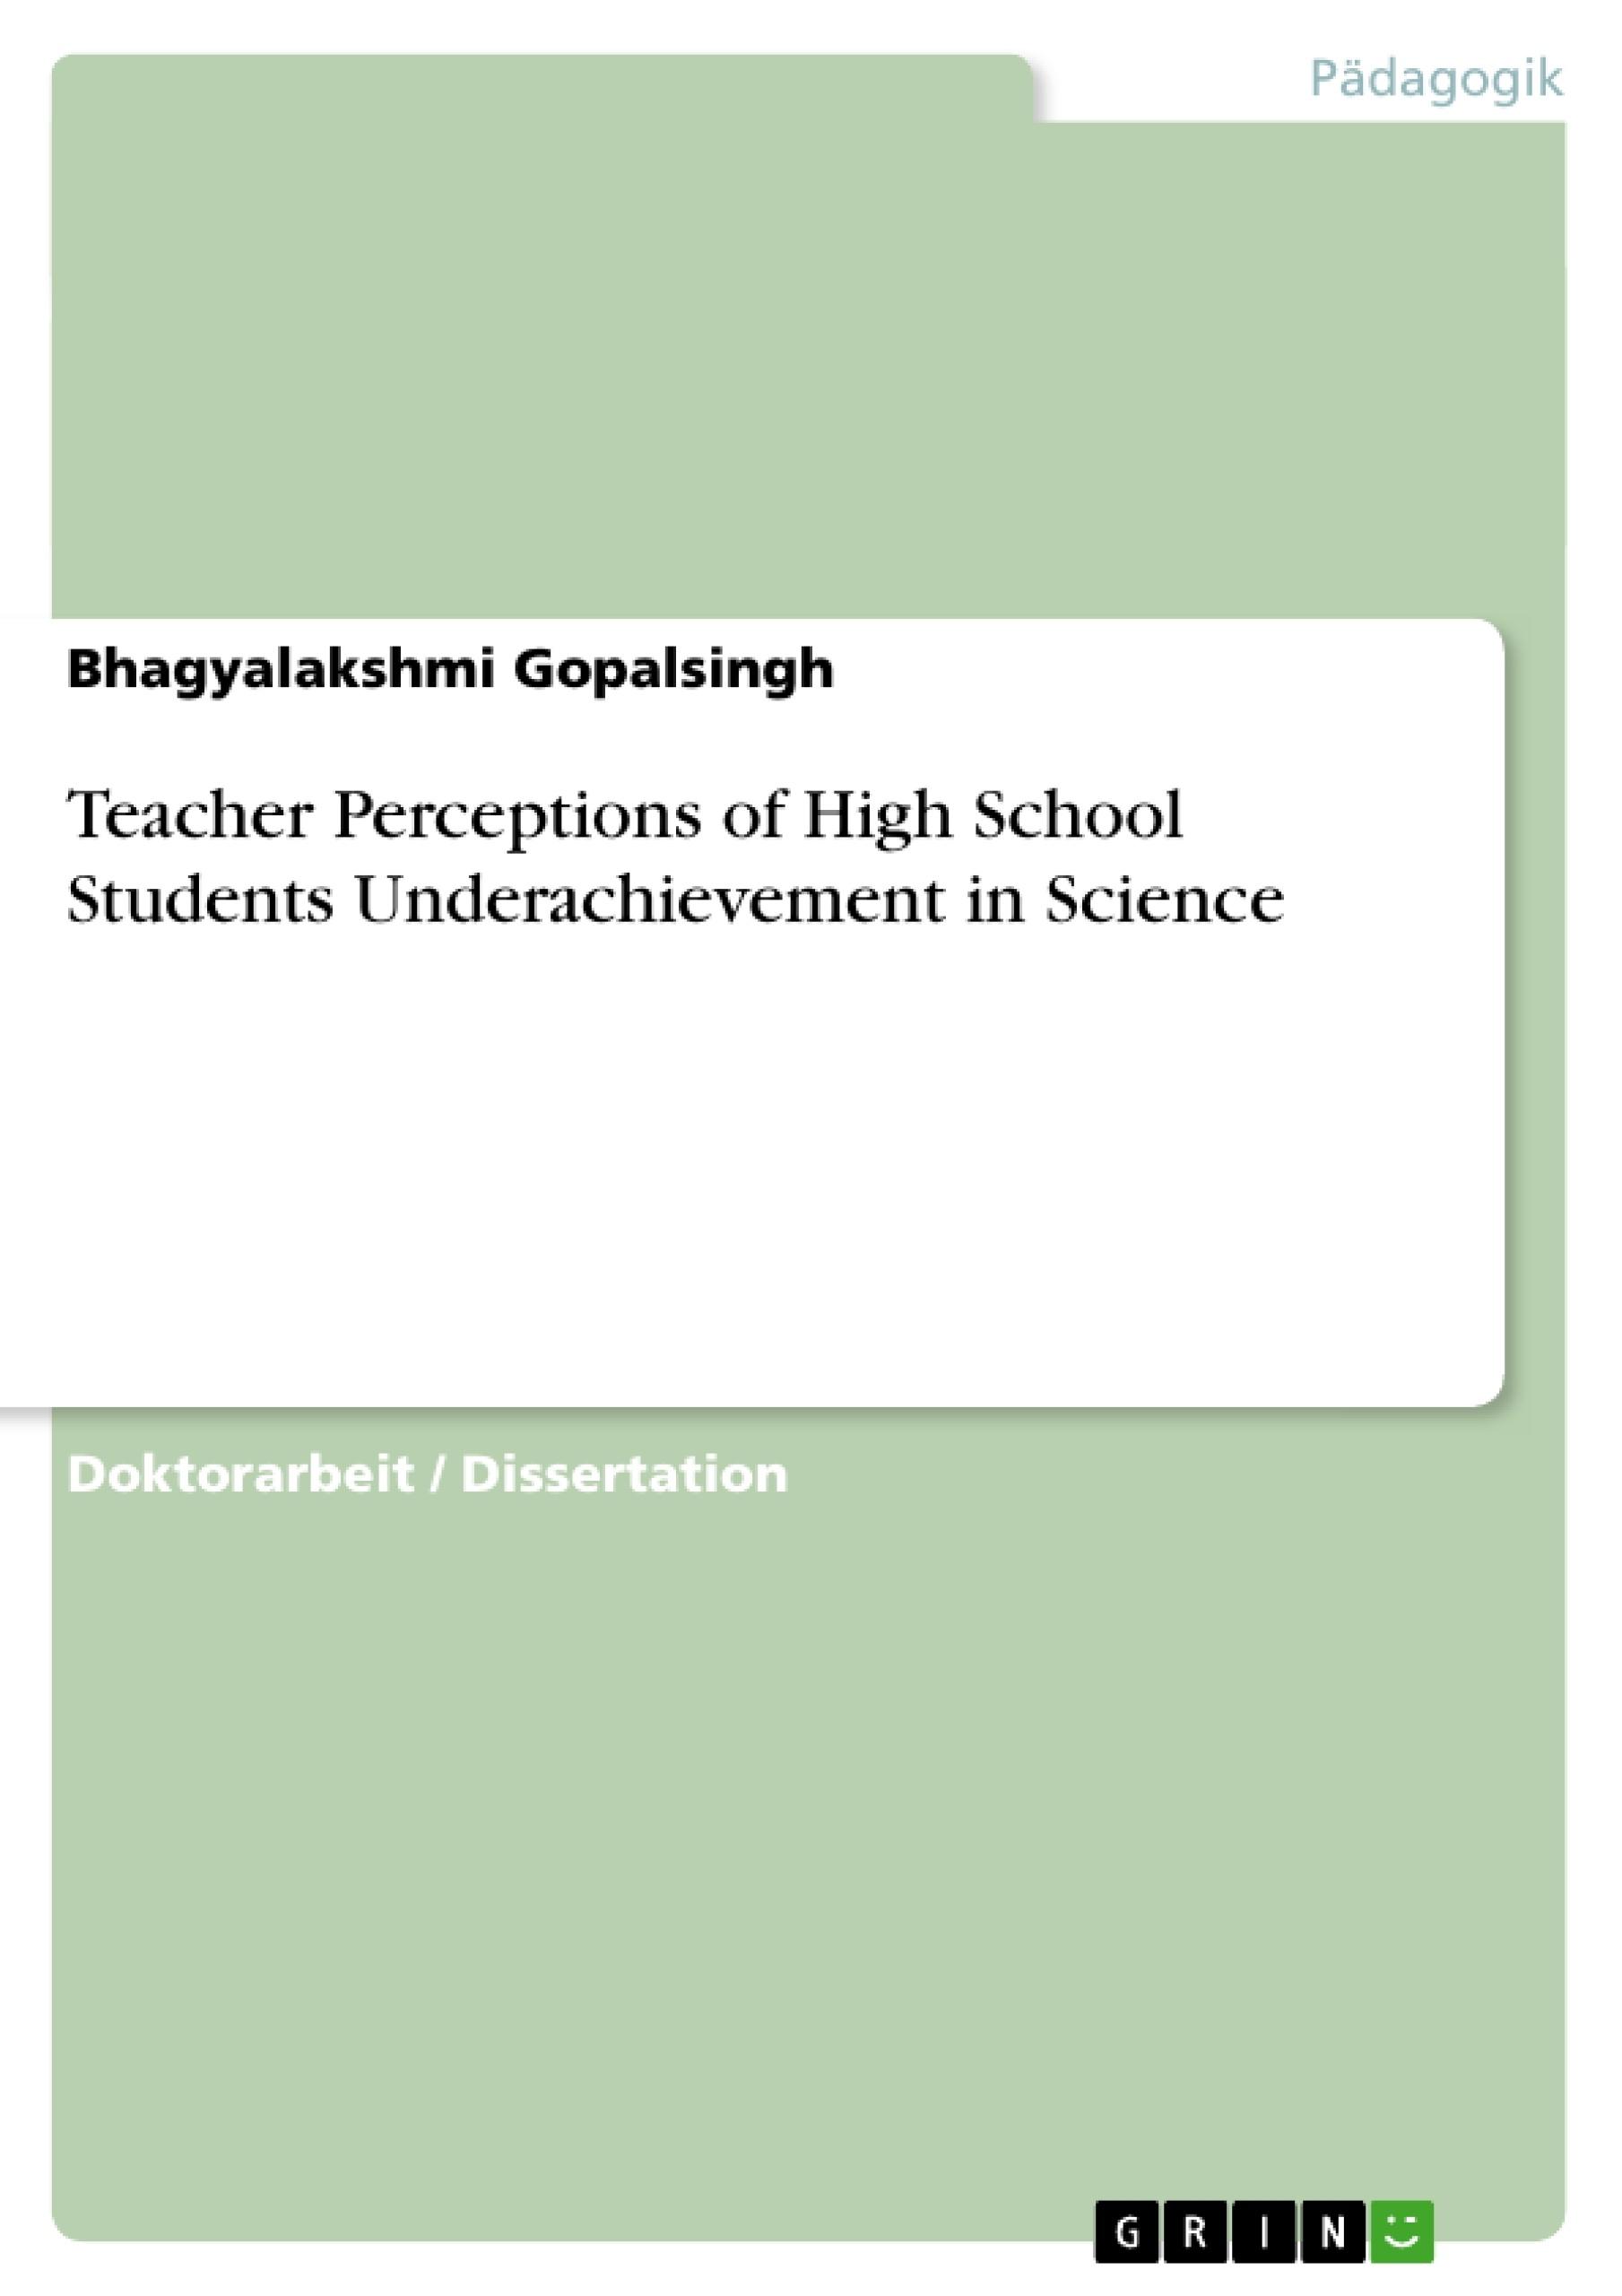 Titel: Teacher Perceptions of High School Students Underachievement in Science